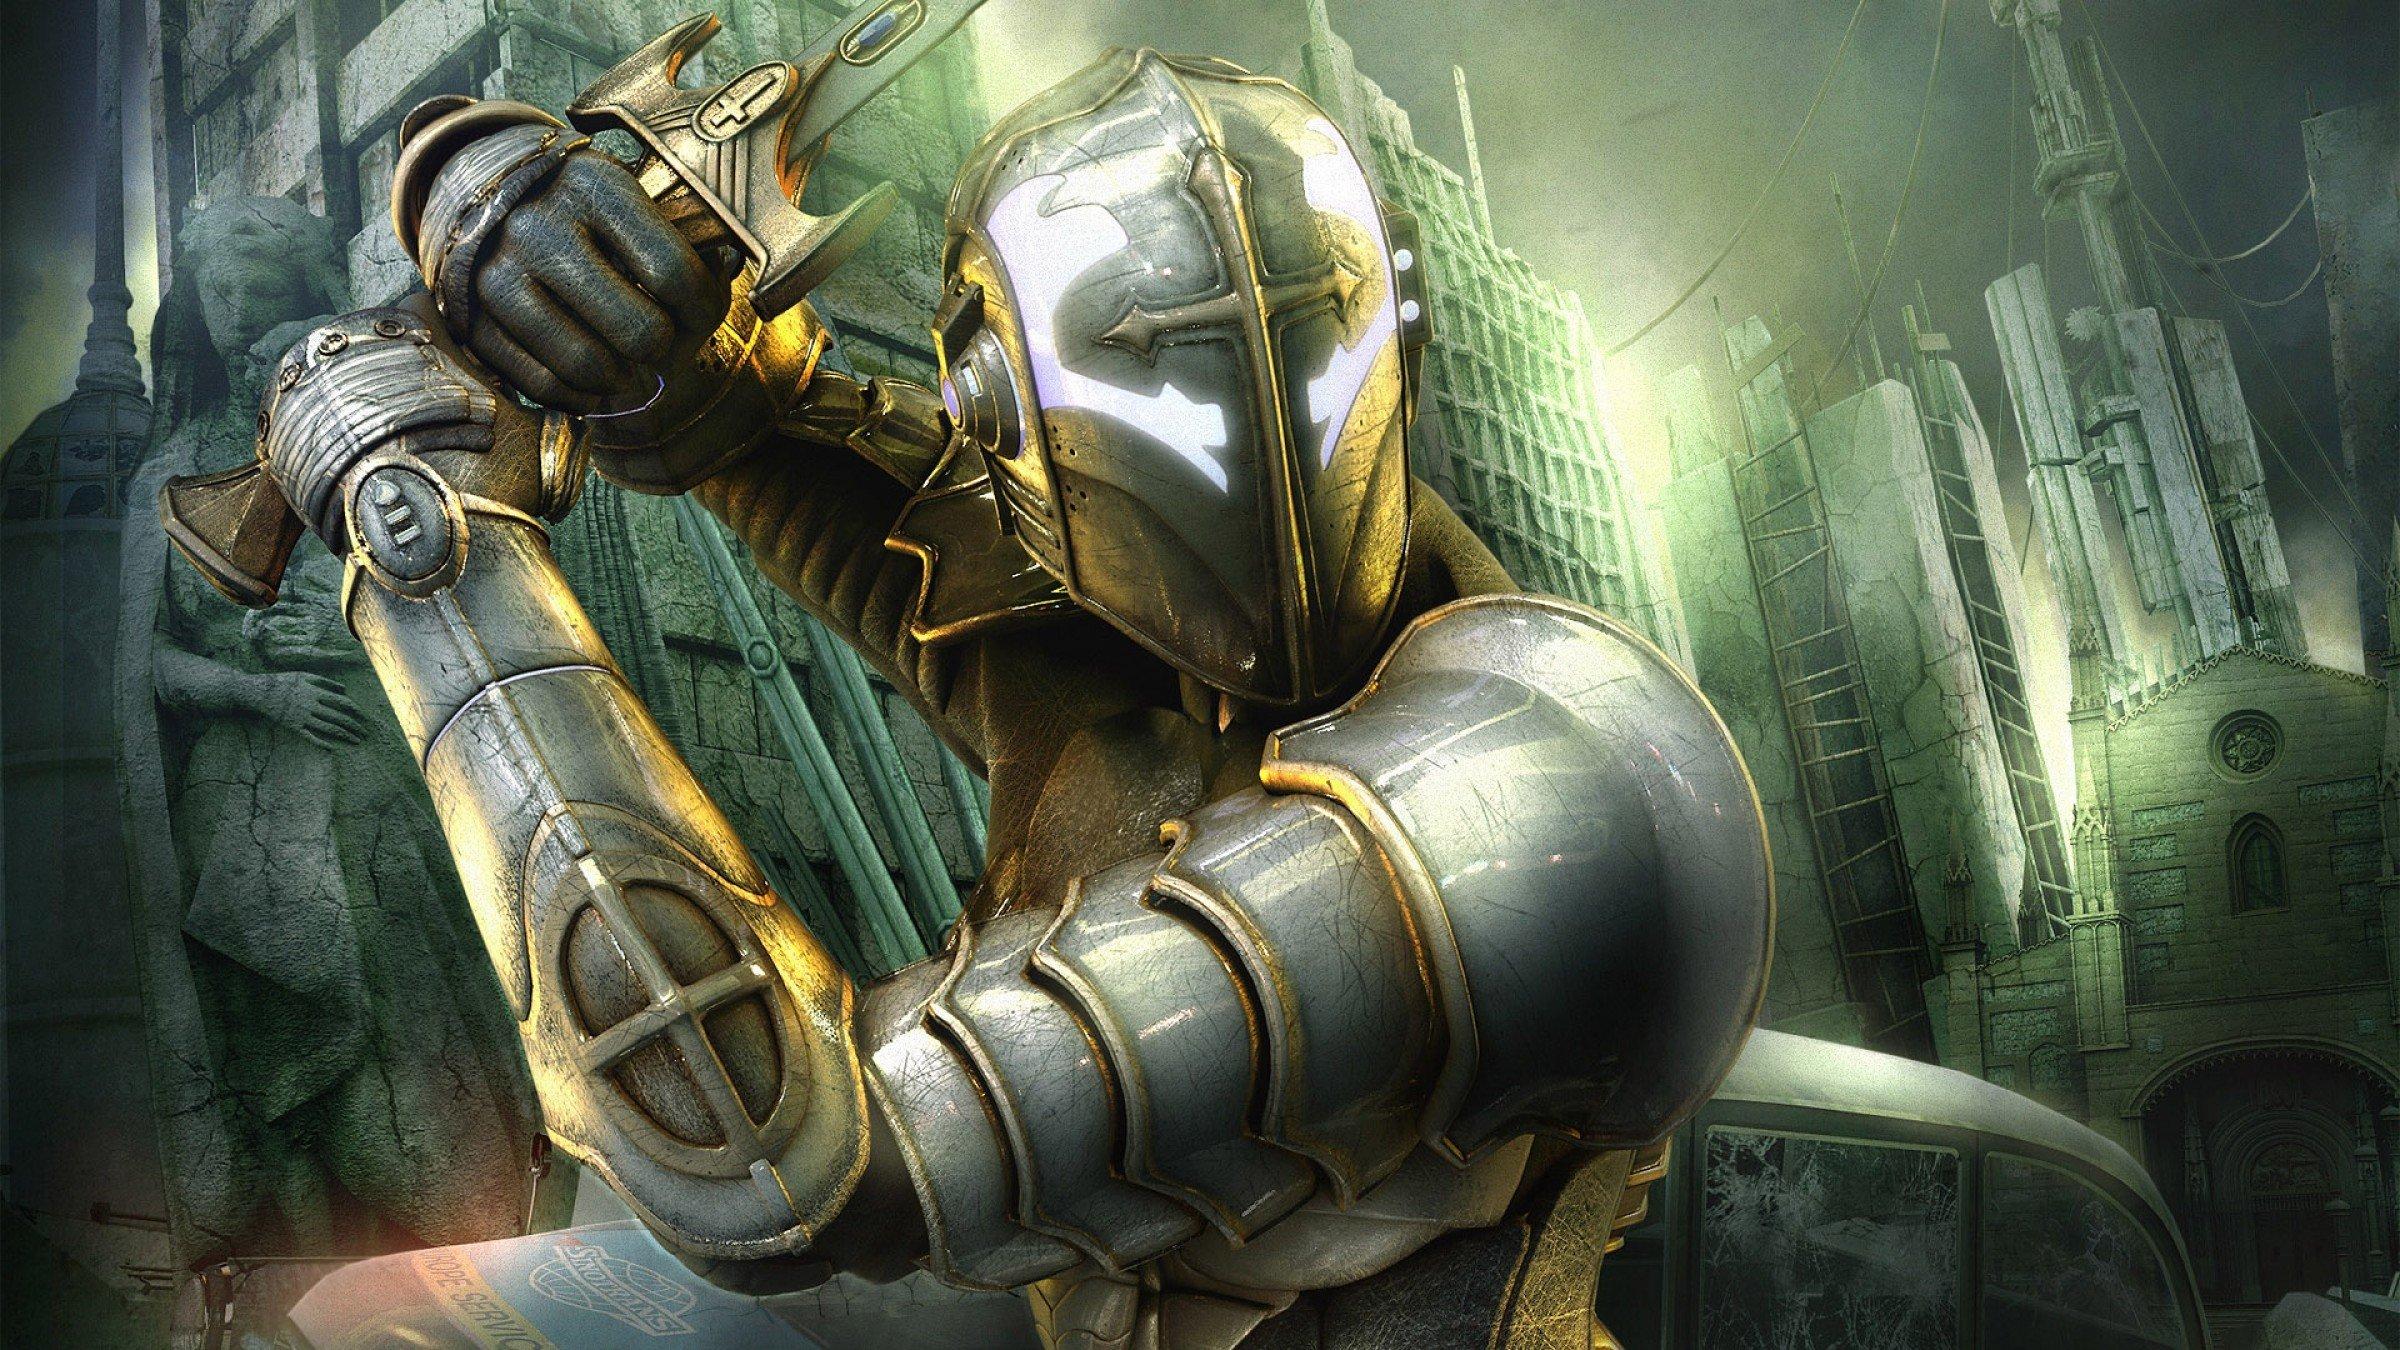 HELLGATE LONDON fantasy action sci-fi warrior knight armor ...